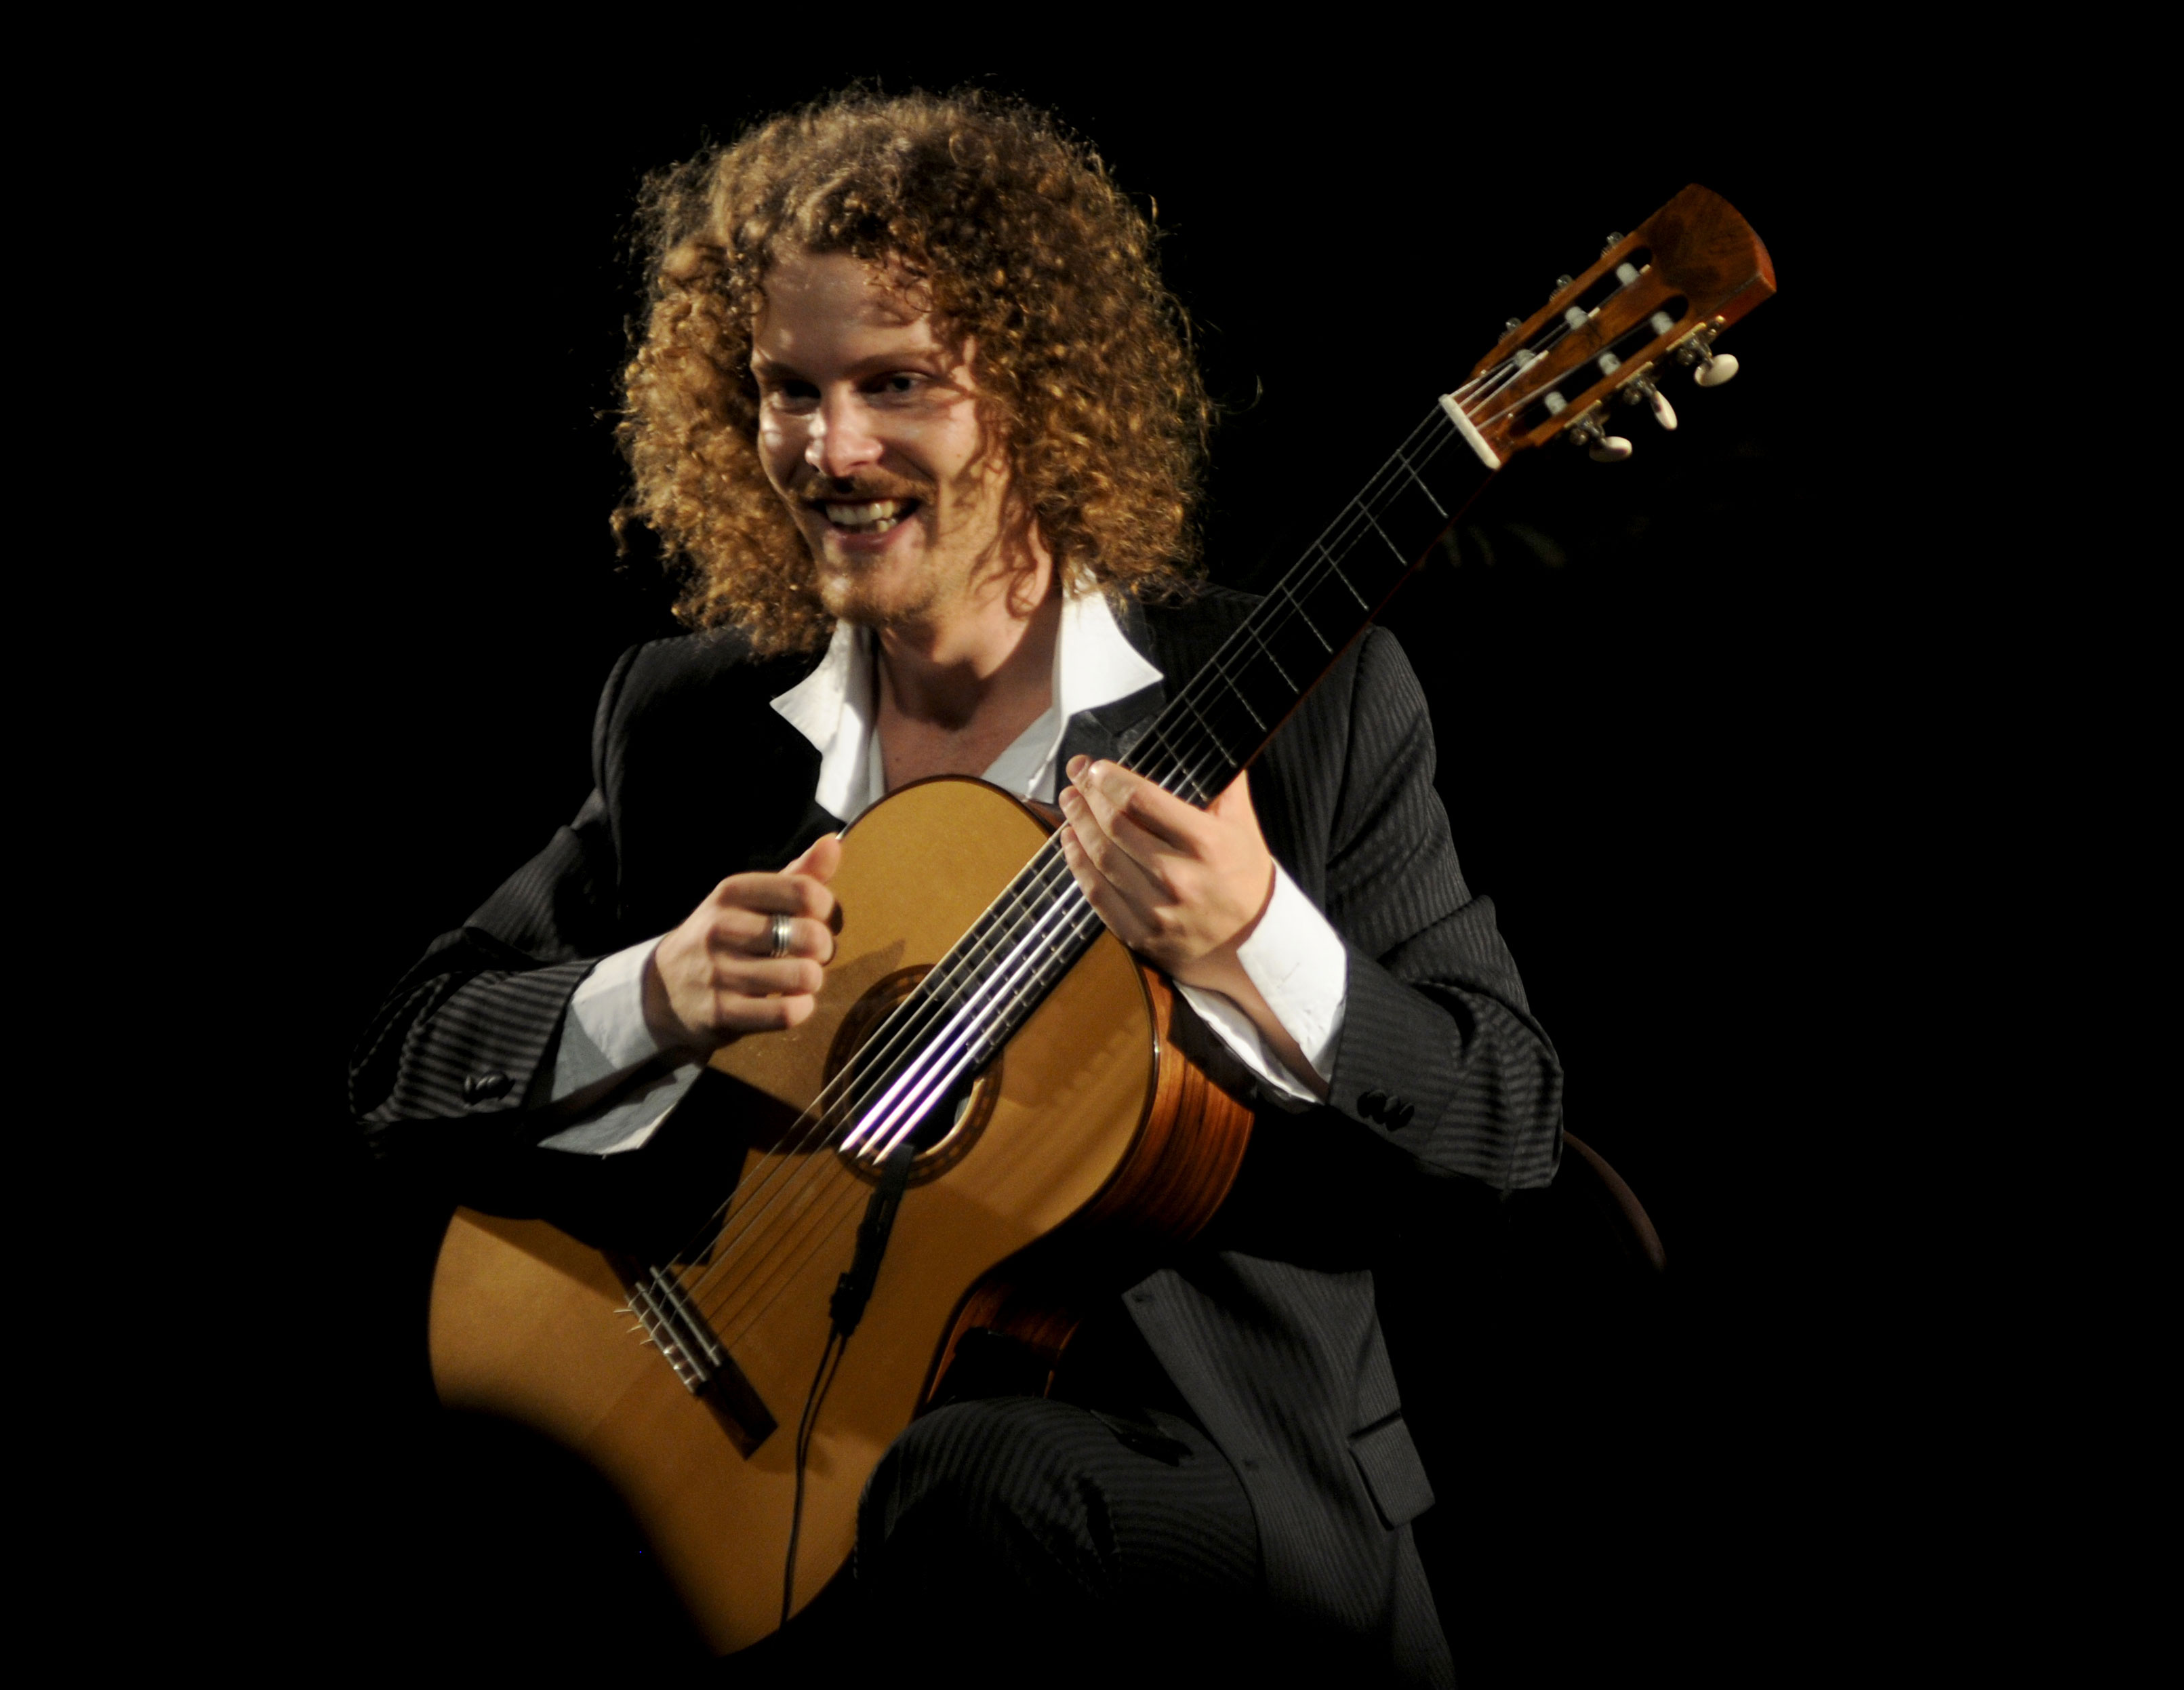 Playing guitar may protect brain health: study